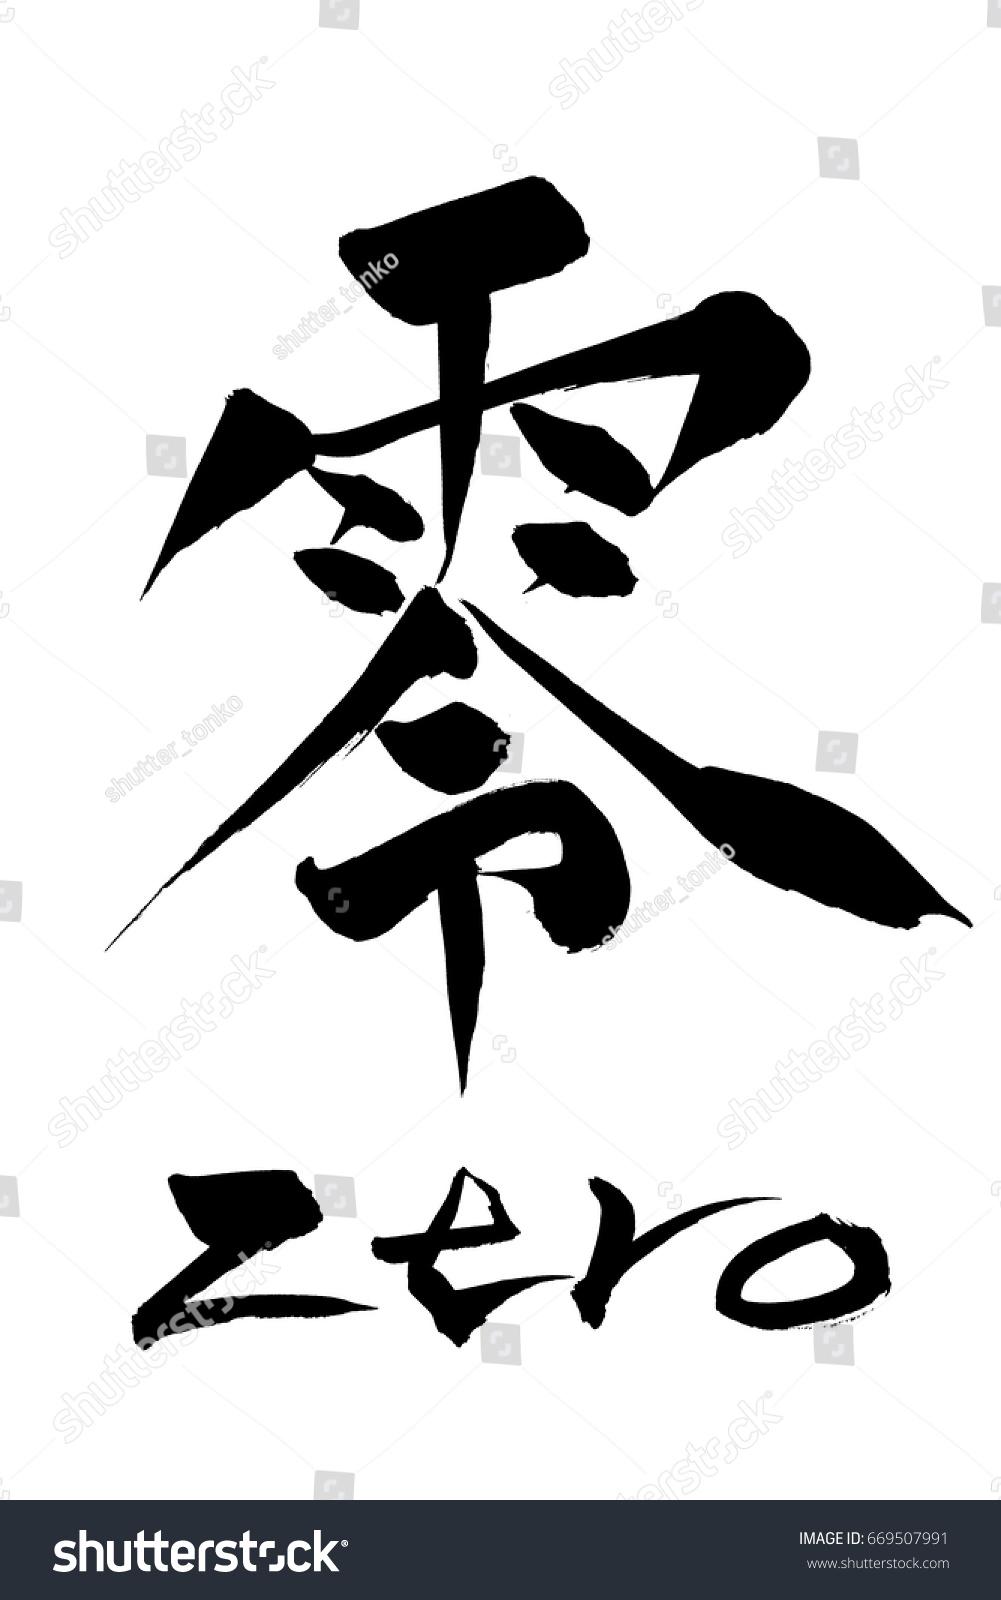 Brush Character Zero Japanese Text Zero Stock Vector Royalty Free